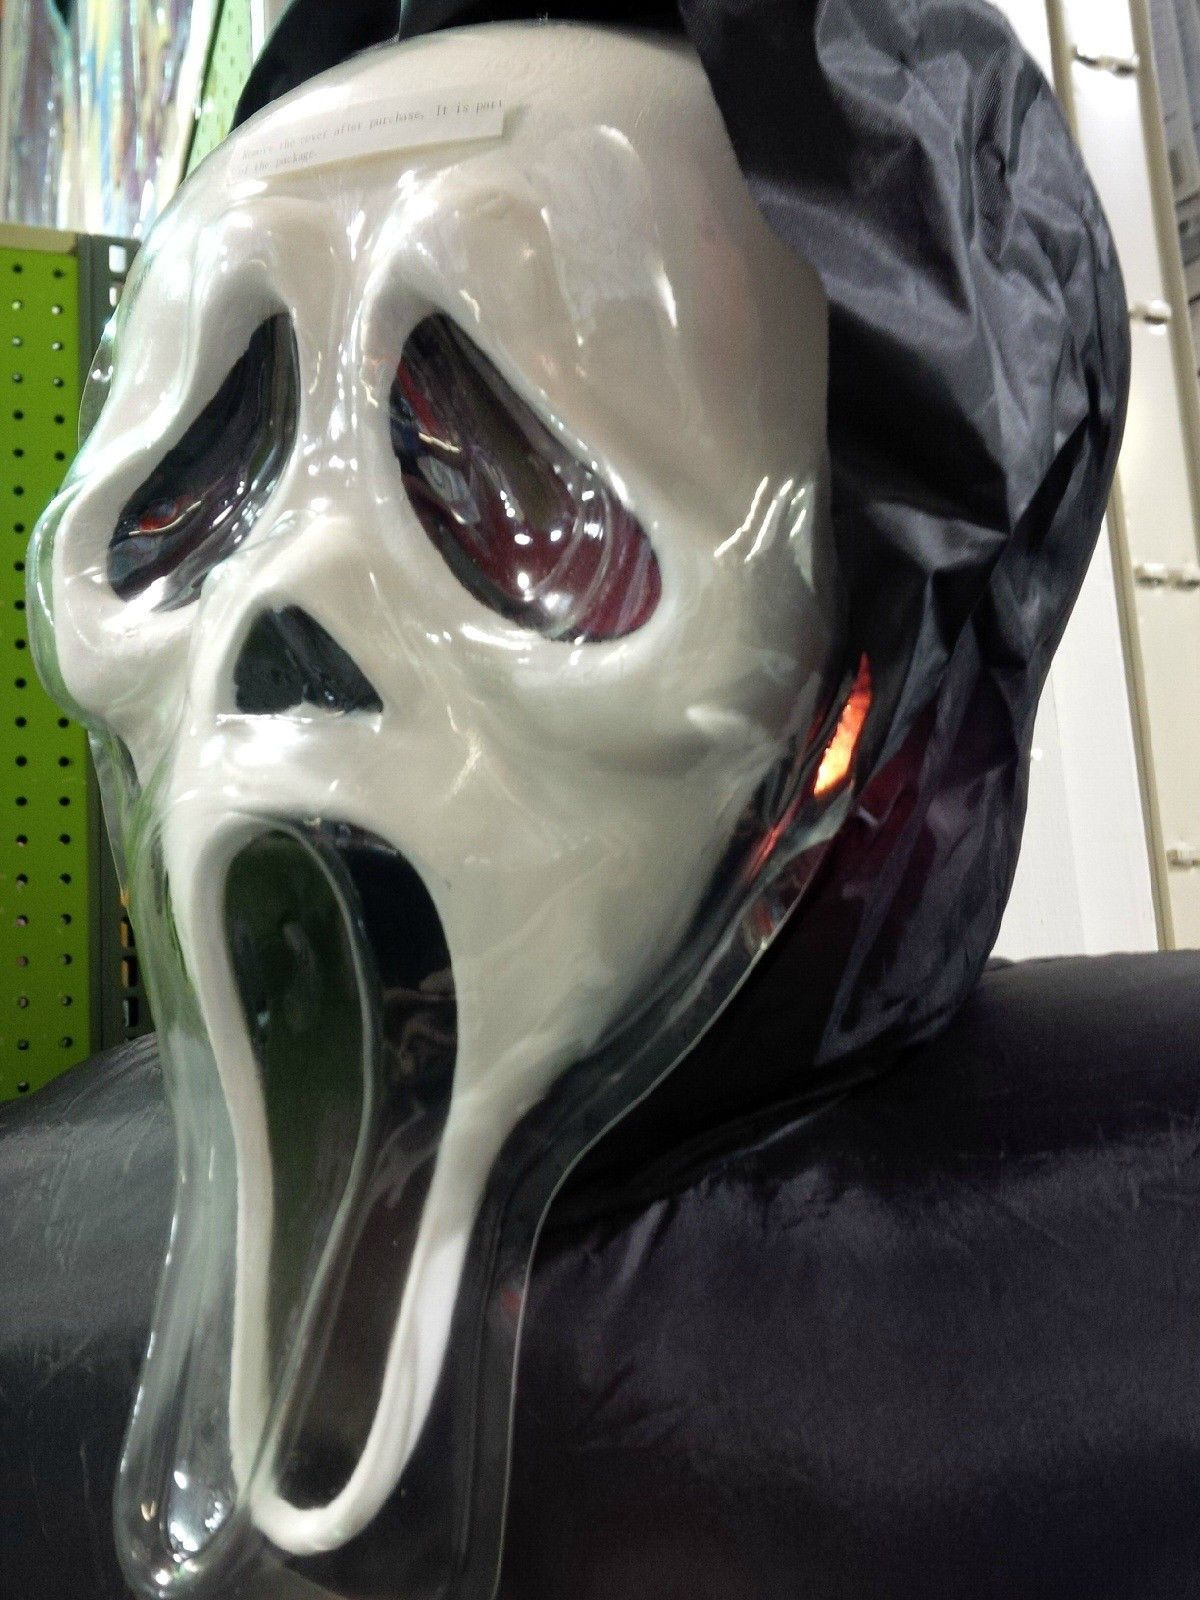 scream movie ghost face halloween inflatable 6 ft gemmy airblown ebay - Halloween Movie History